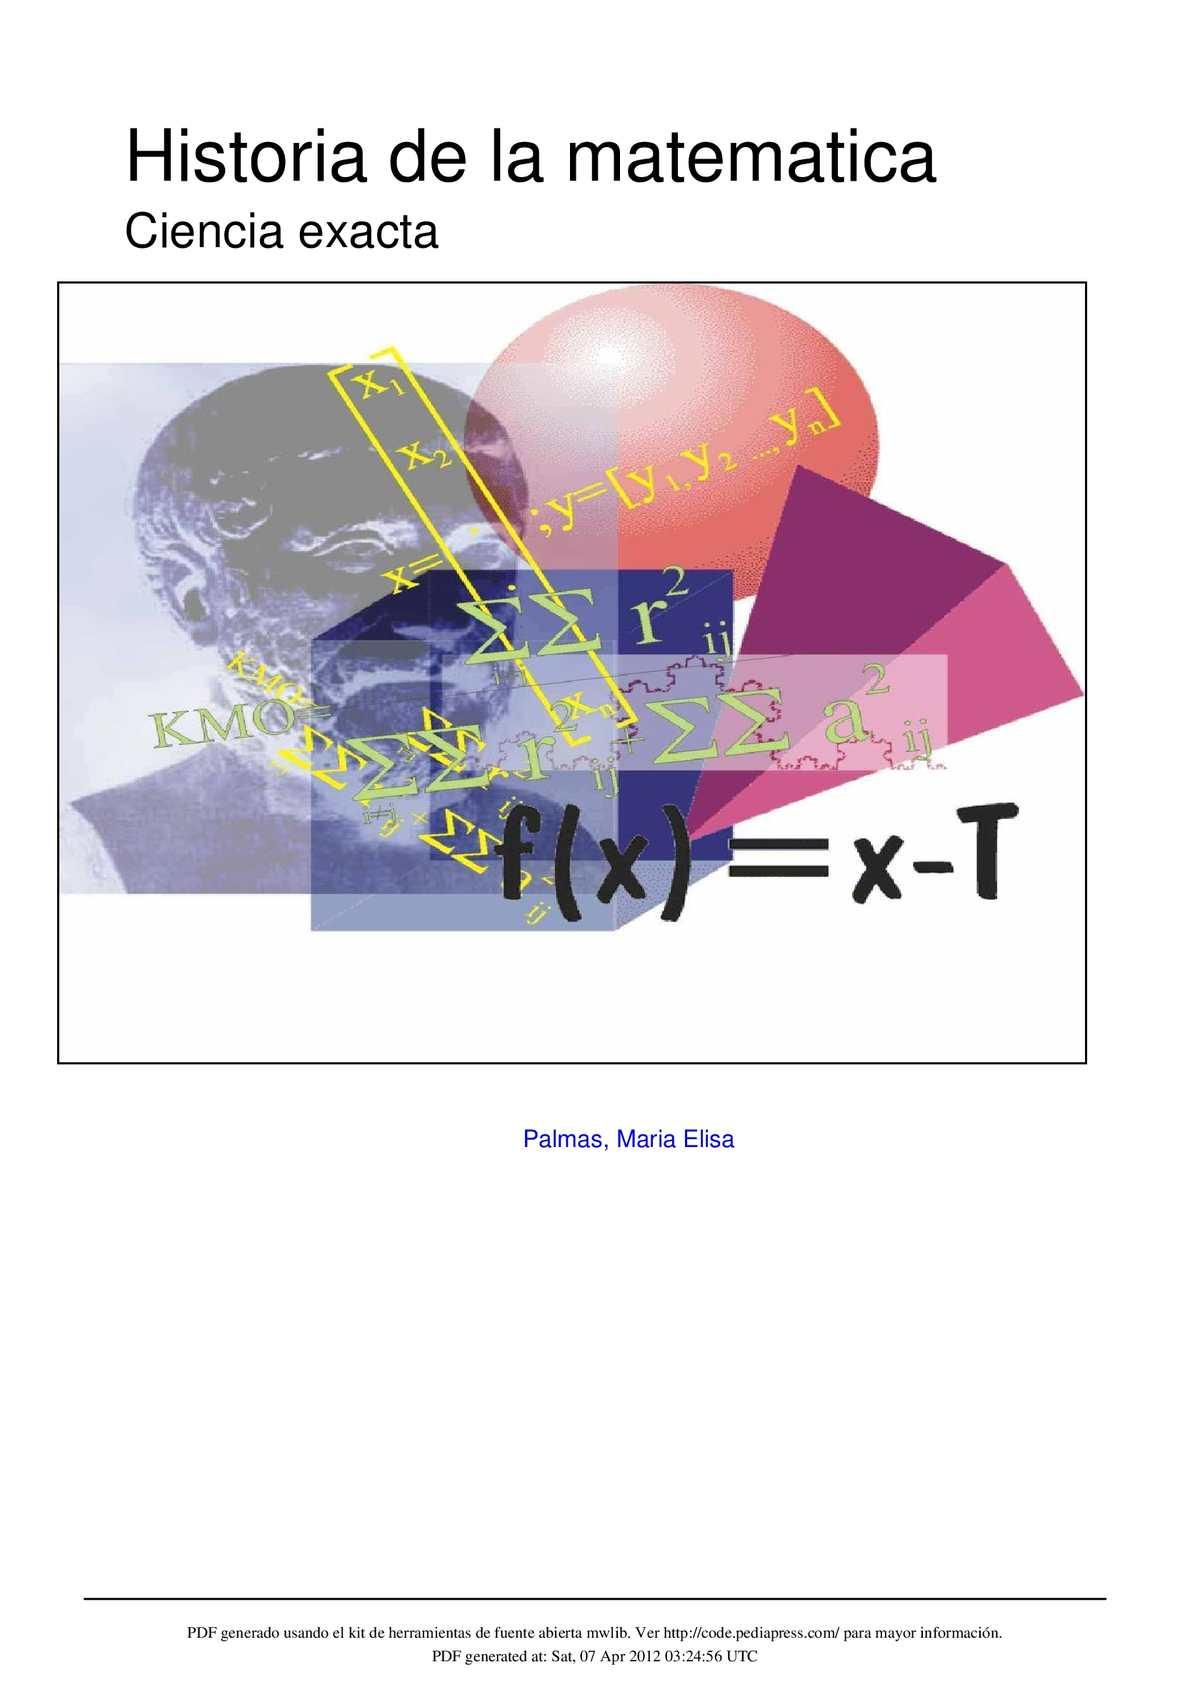 Calaméo - historia de la matemática.